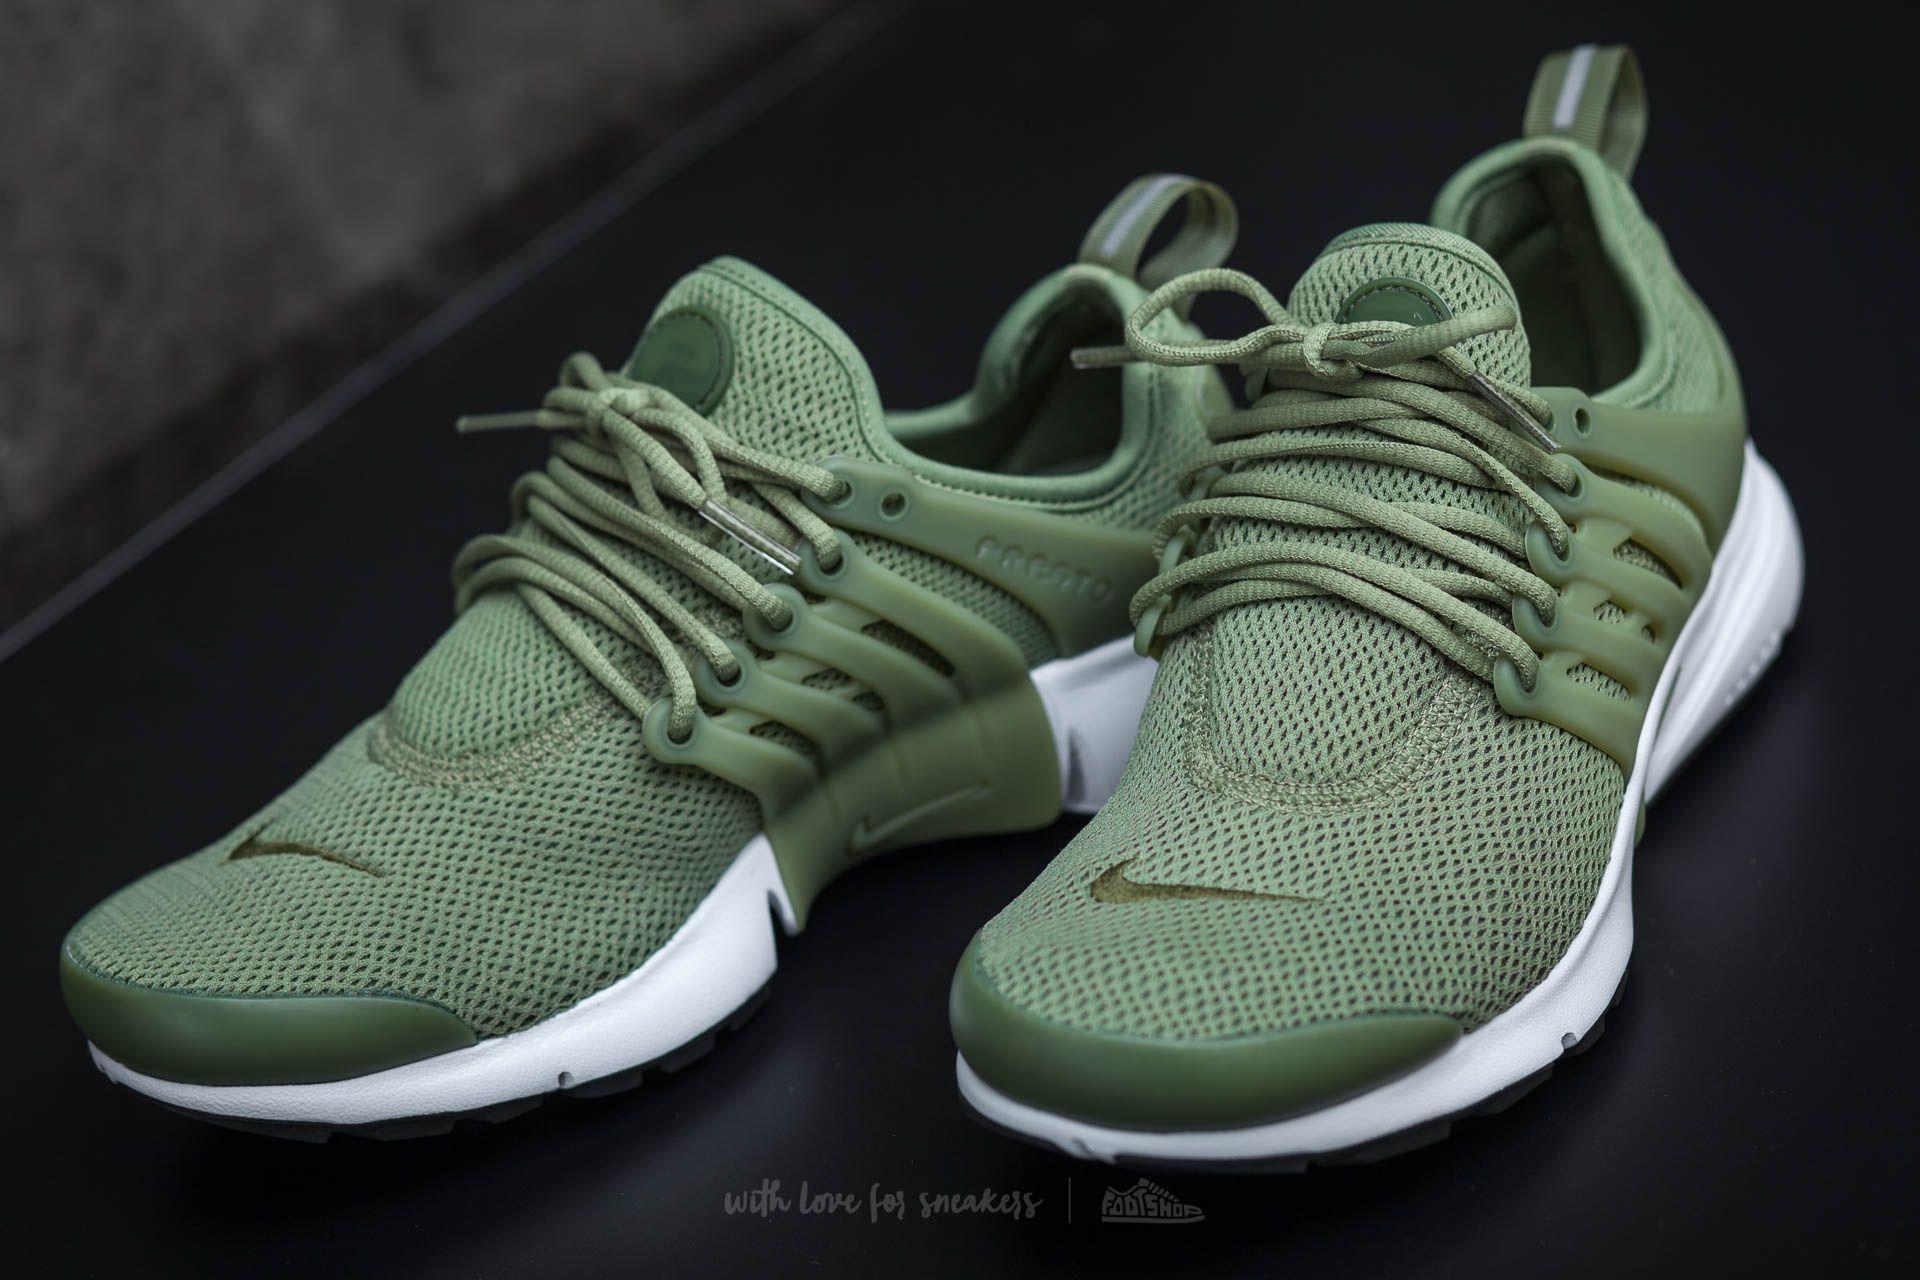 72766e4f34c1 Lyst - Nike W Air Presto Palm Green  Palm Green in Green for Men